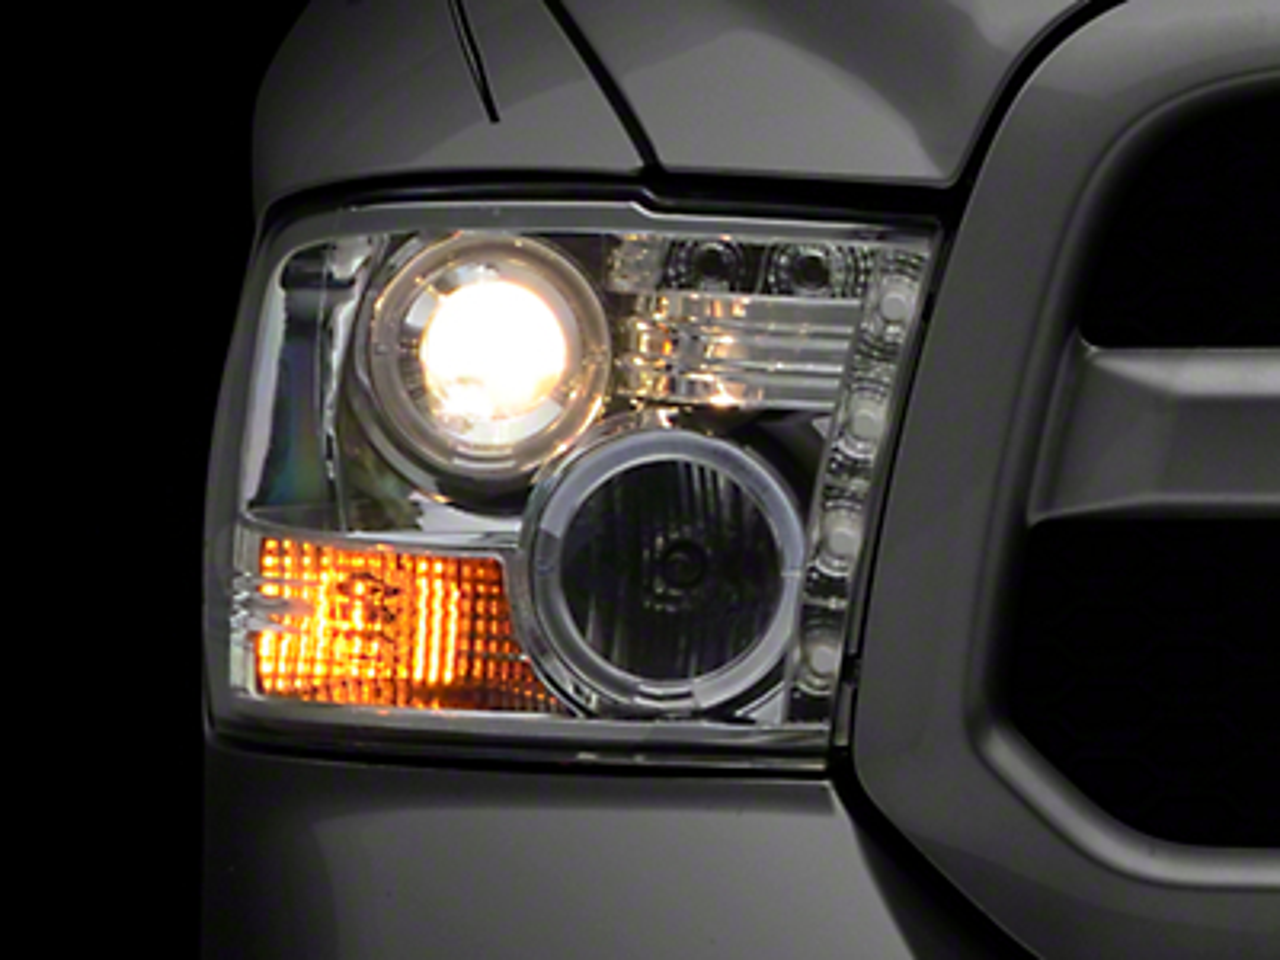 Axial Chrome Projector Headlights w/ LED Halos (09-18 RAM 1500 w/o Projector Headlights)